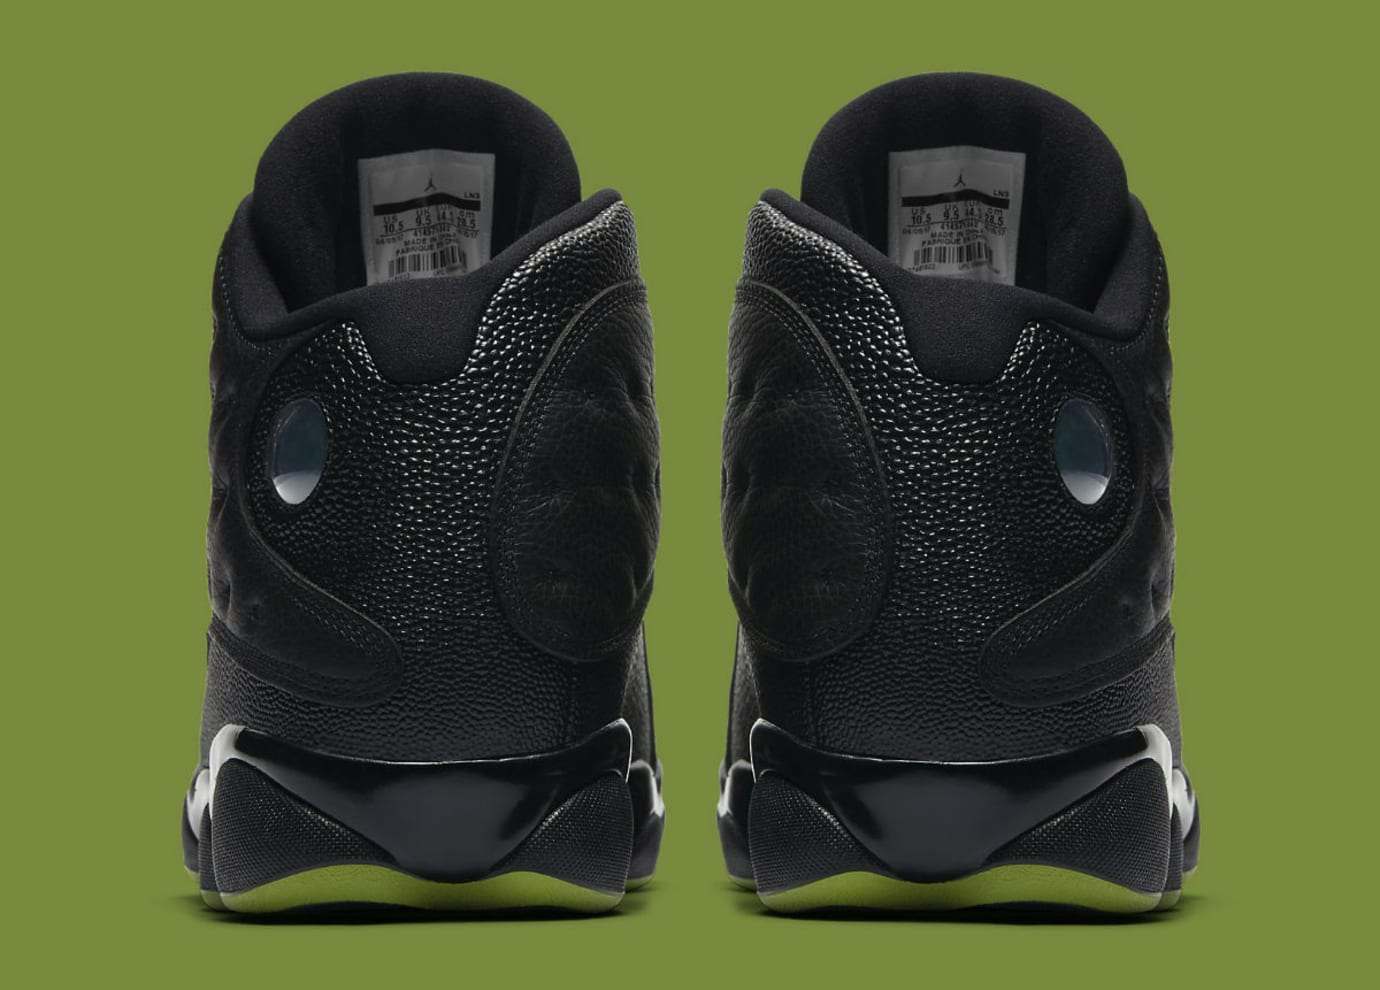 Air Jordan 13 Altitude Release Date 414571-042 Heel